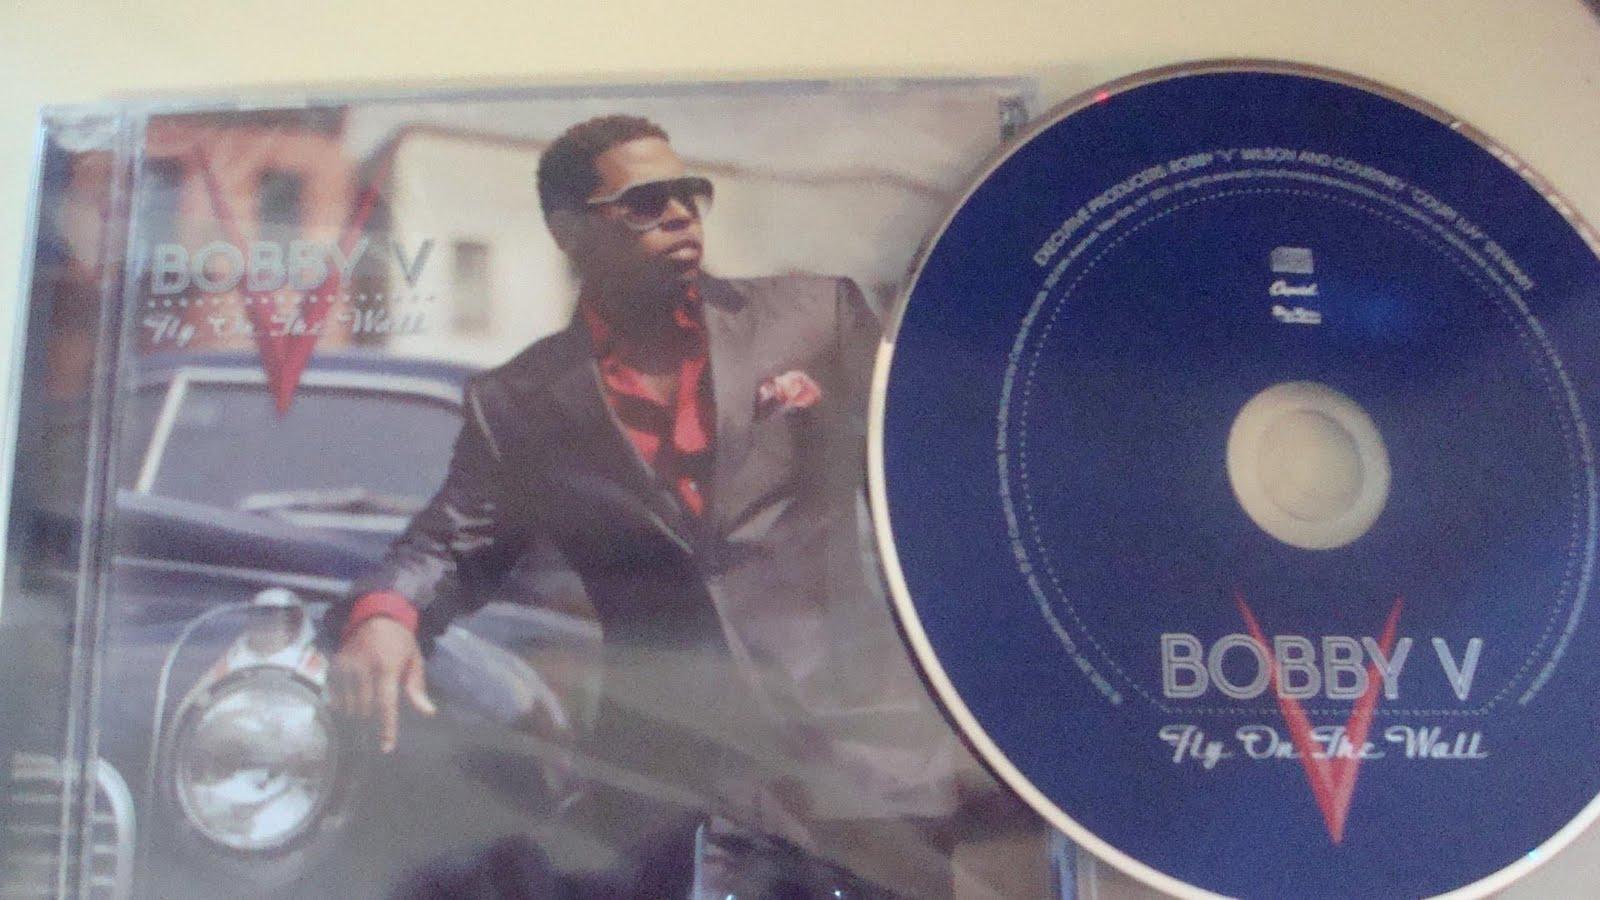 Fly on the Wall (Bobby V album)